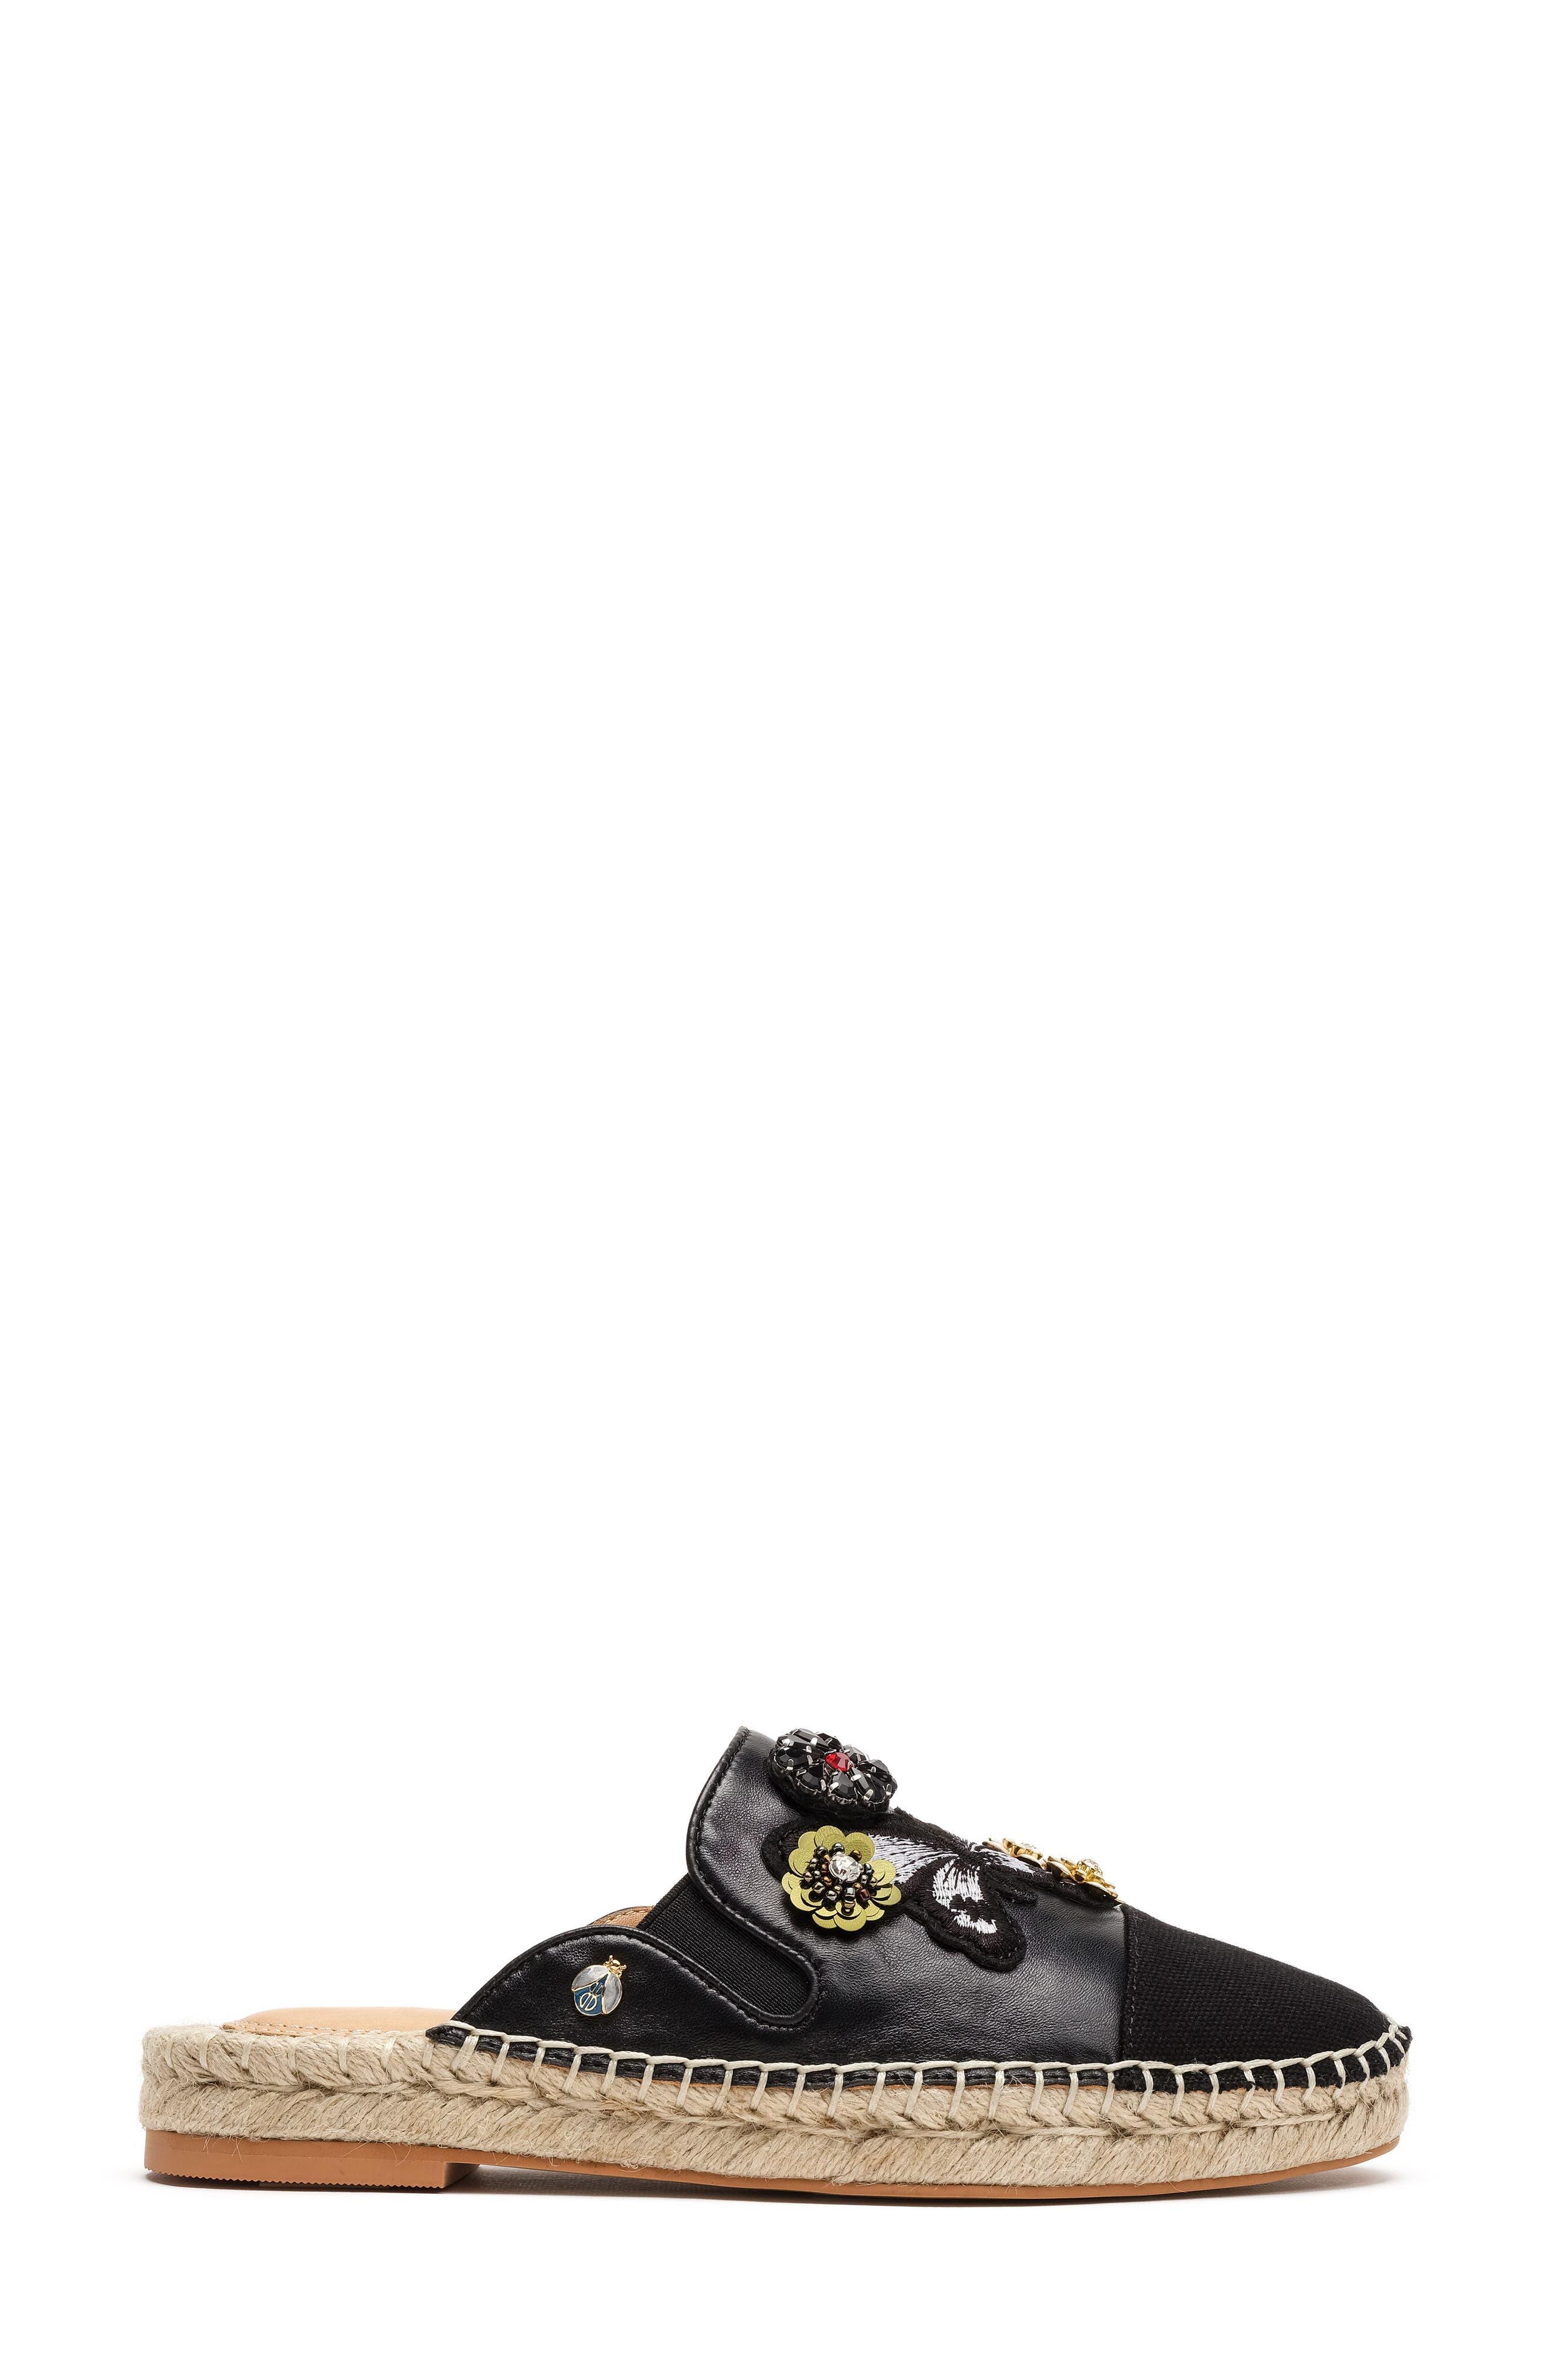 Bill Blass Women's Wallis Embellished Espadrille Mule V1xCETVAf